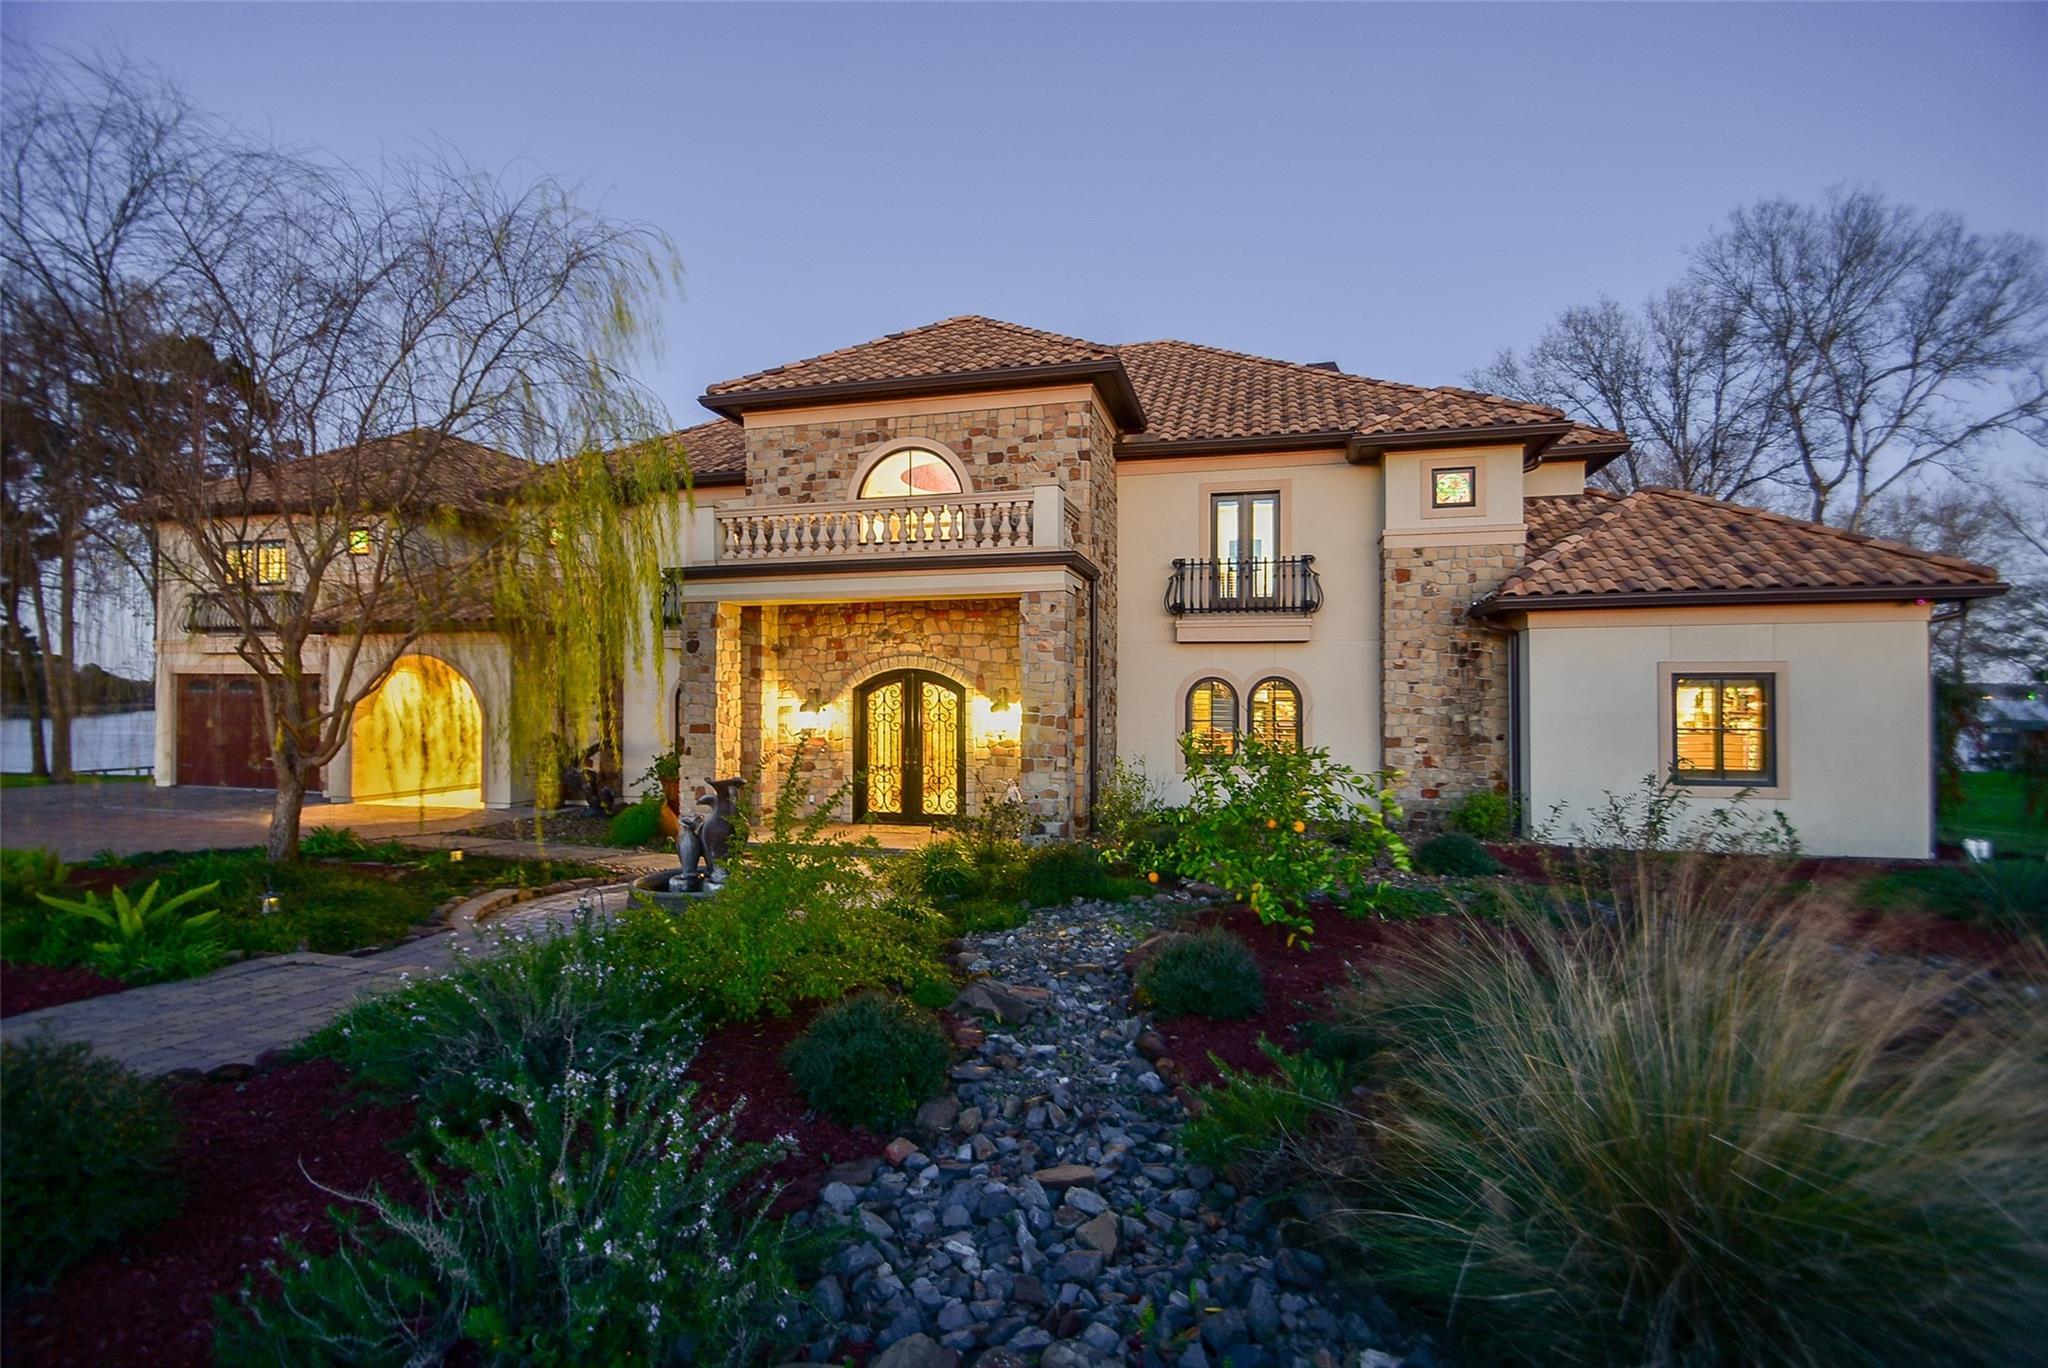 2073 Fm 3186 Property Photo - Onalaska, TX real estate listing